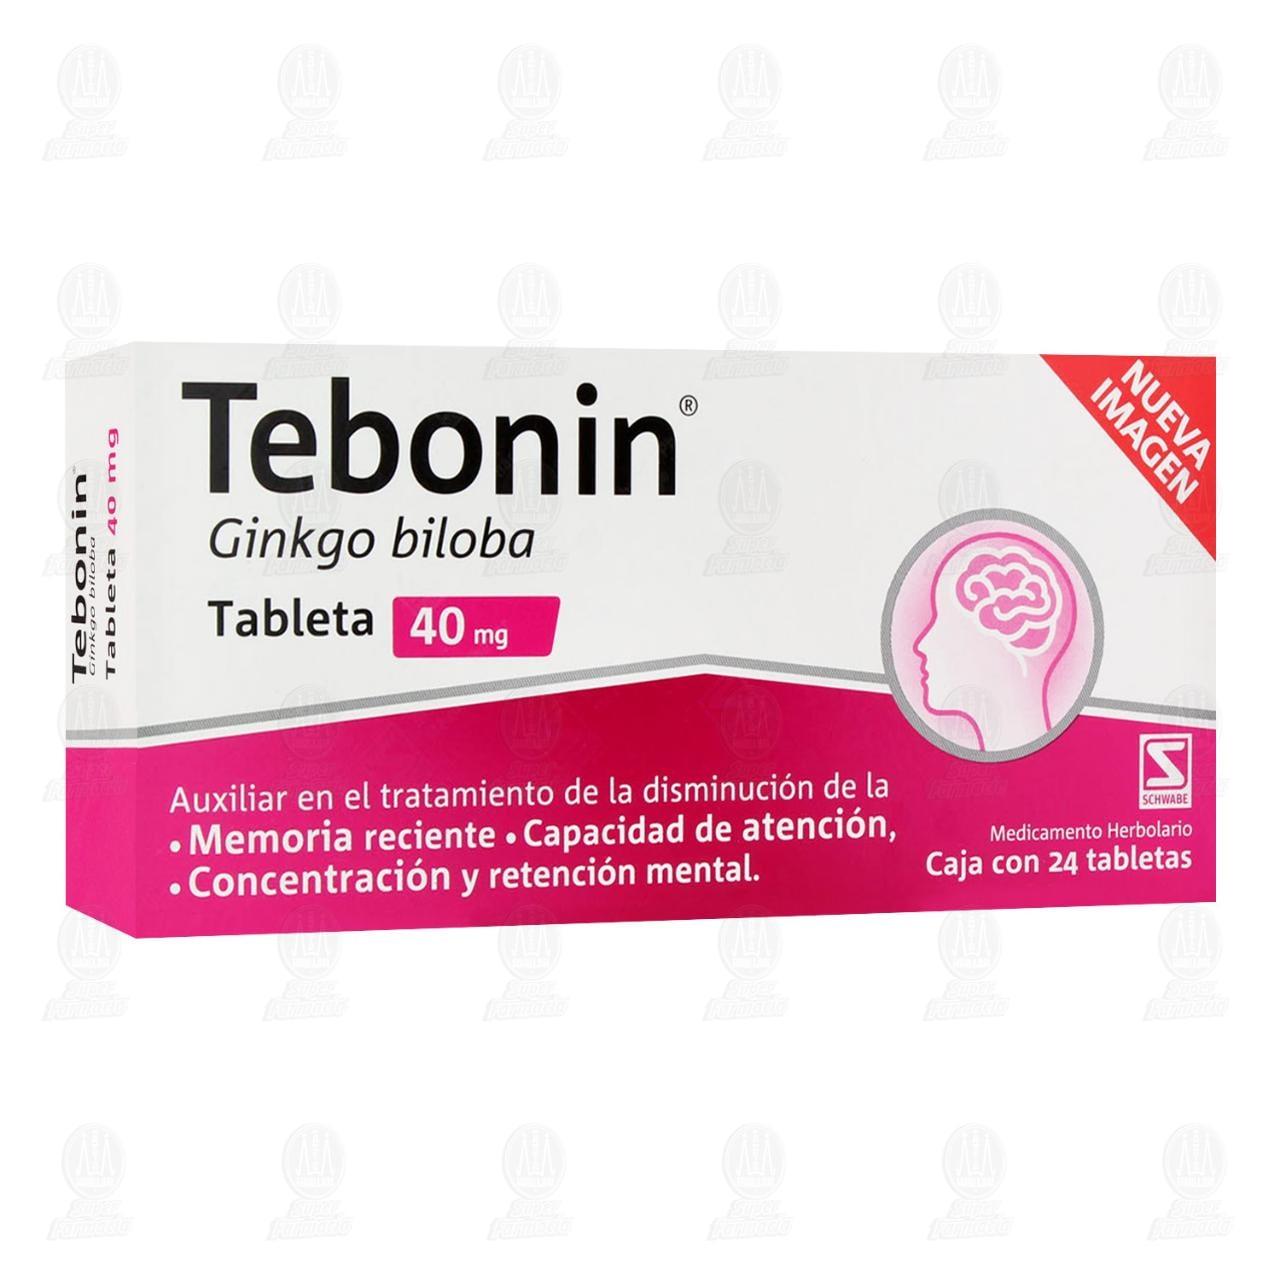 Comprar Tebonin 40mg 24 Tabletas en Farmacias Guadalajara